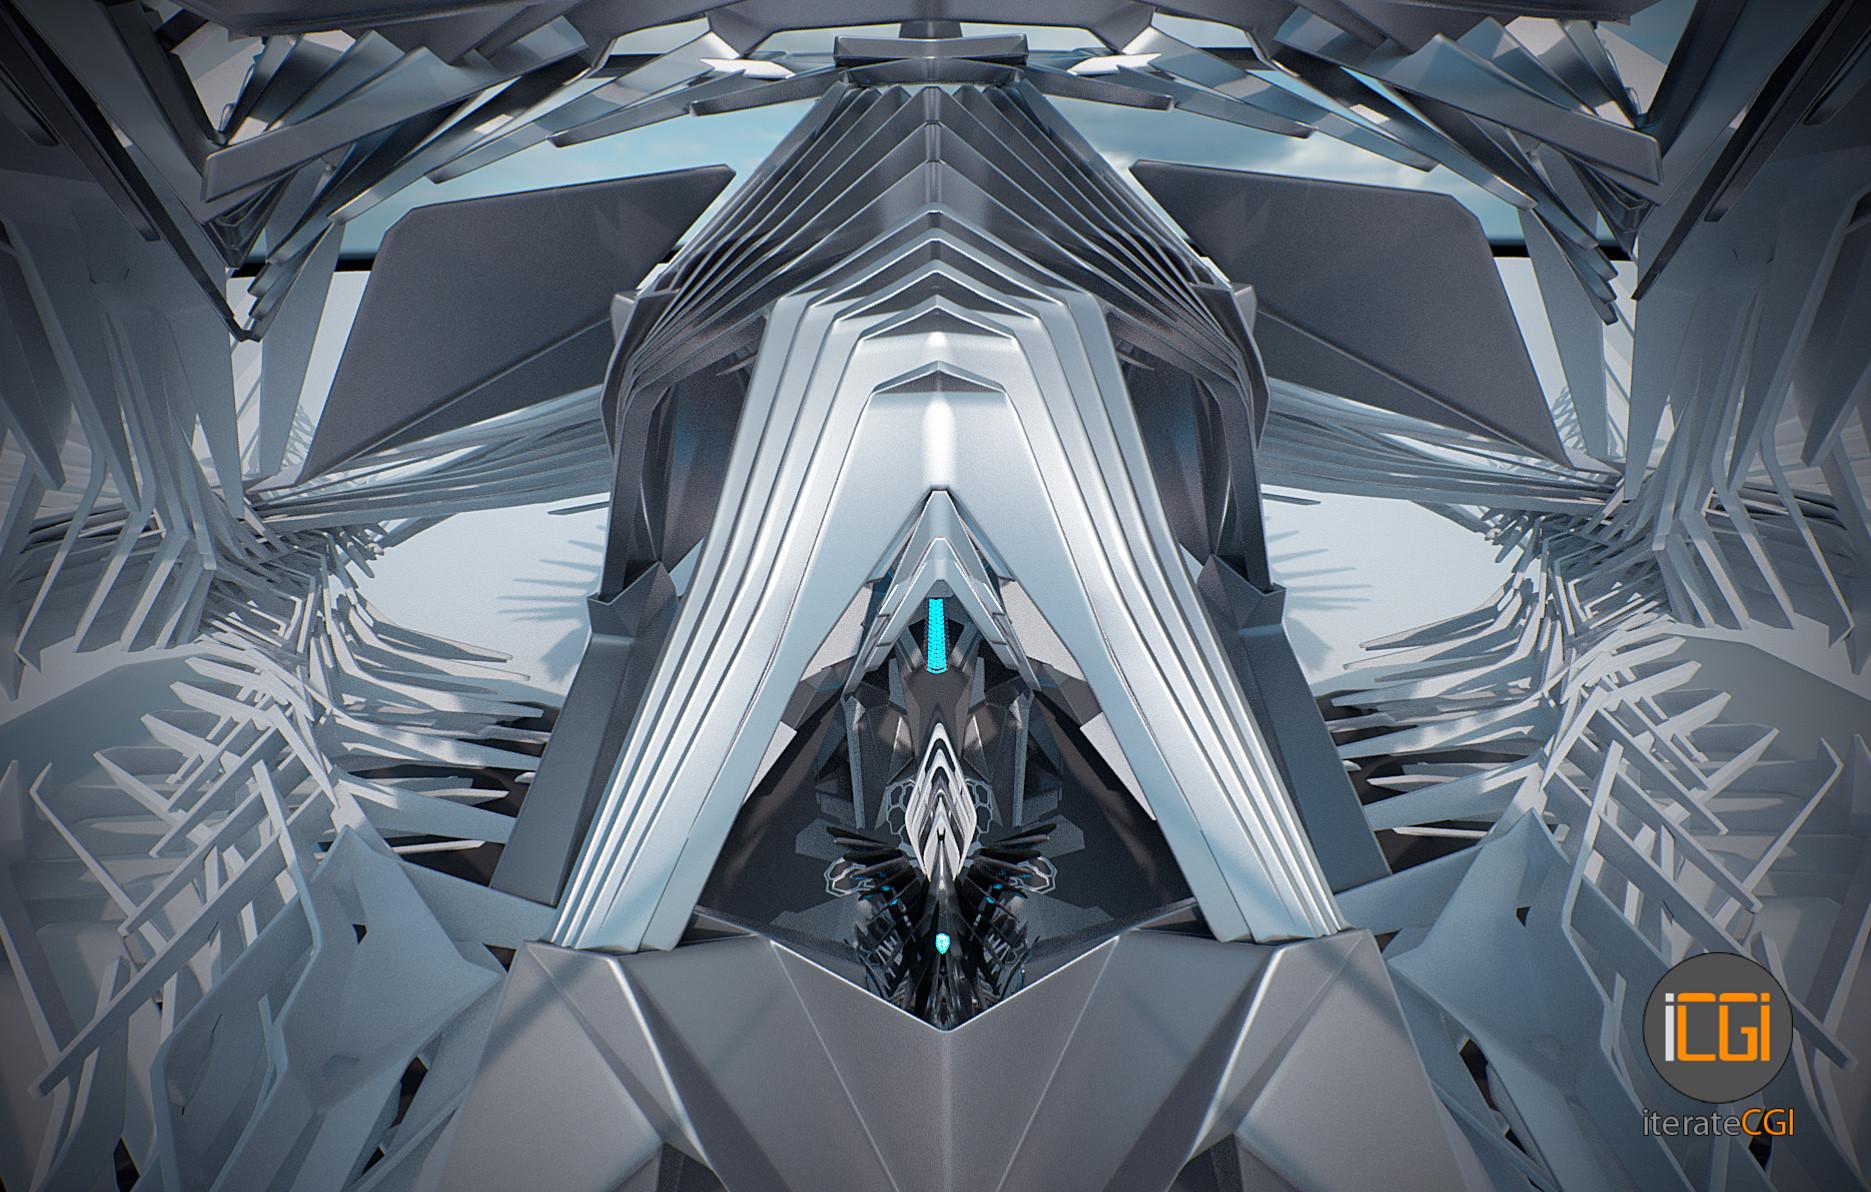 Johan de leenheer generative 3d symmetries 3